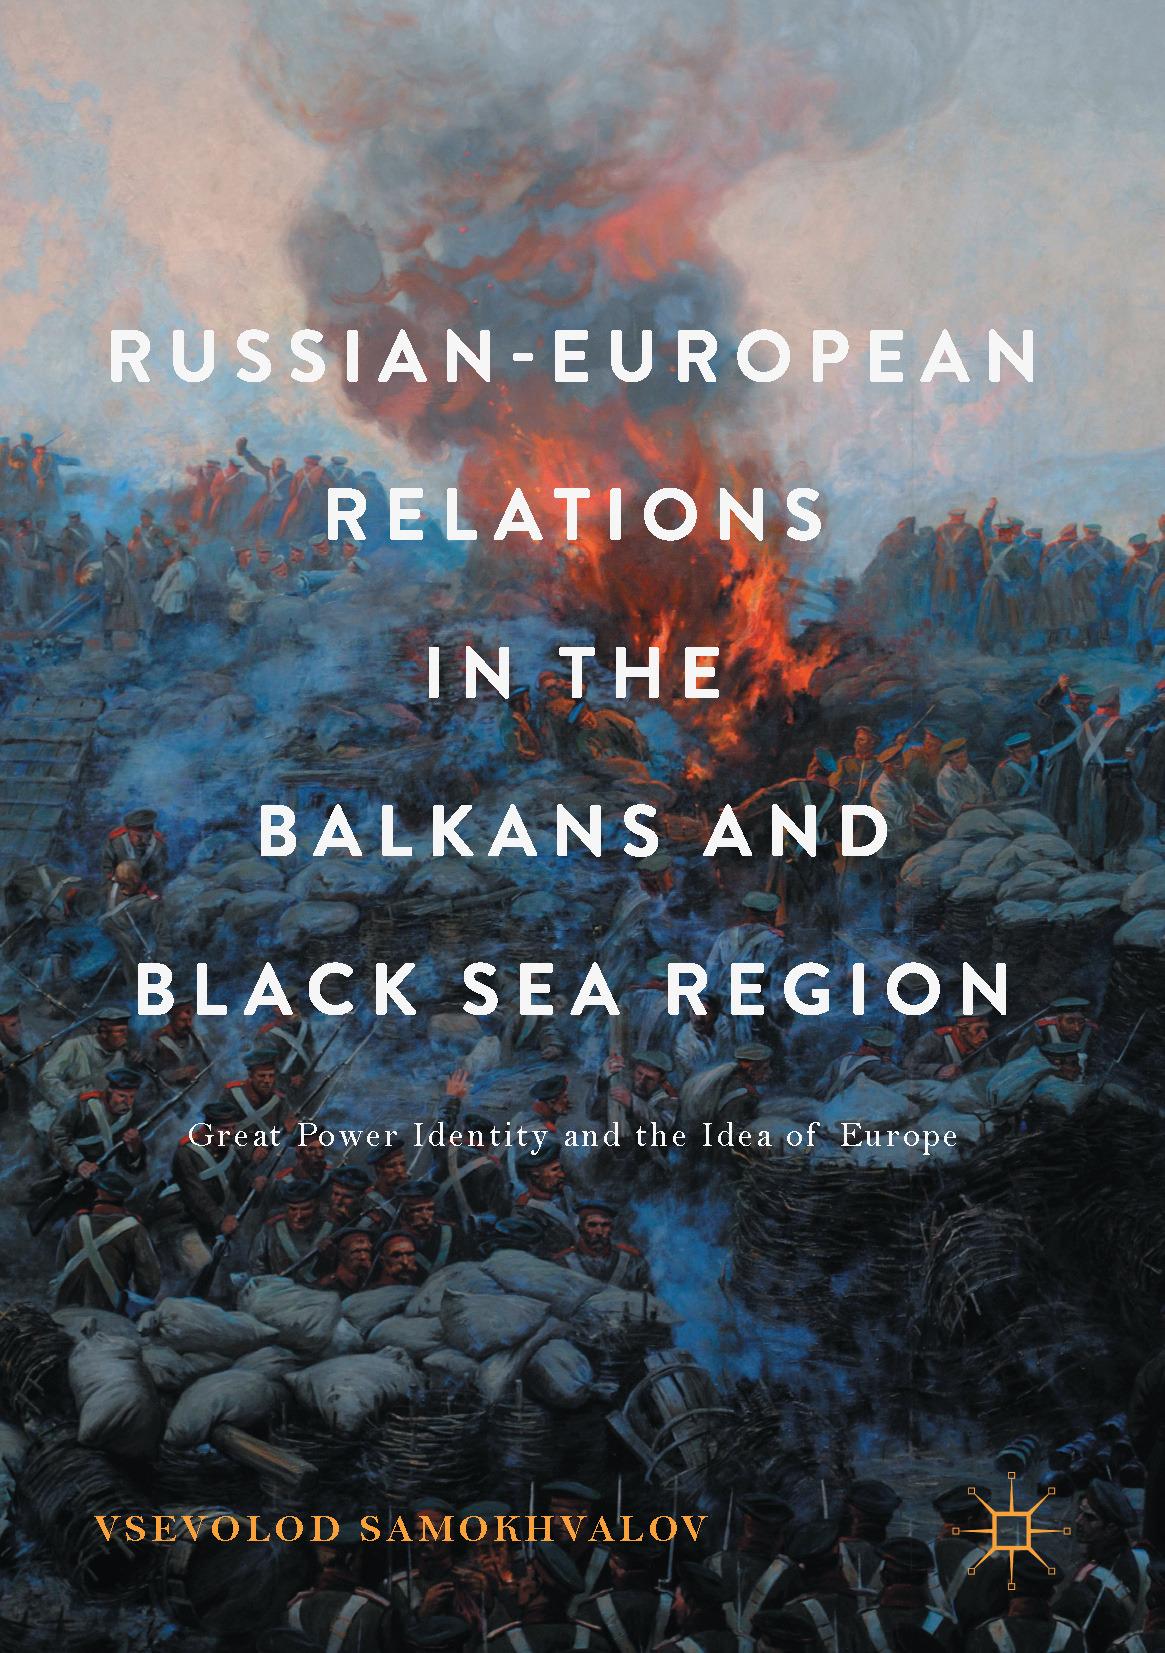 Samokhvalov, Vsevolod - Russian-European Relations in the Balkans and Black Sea Region, ebook